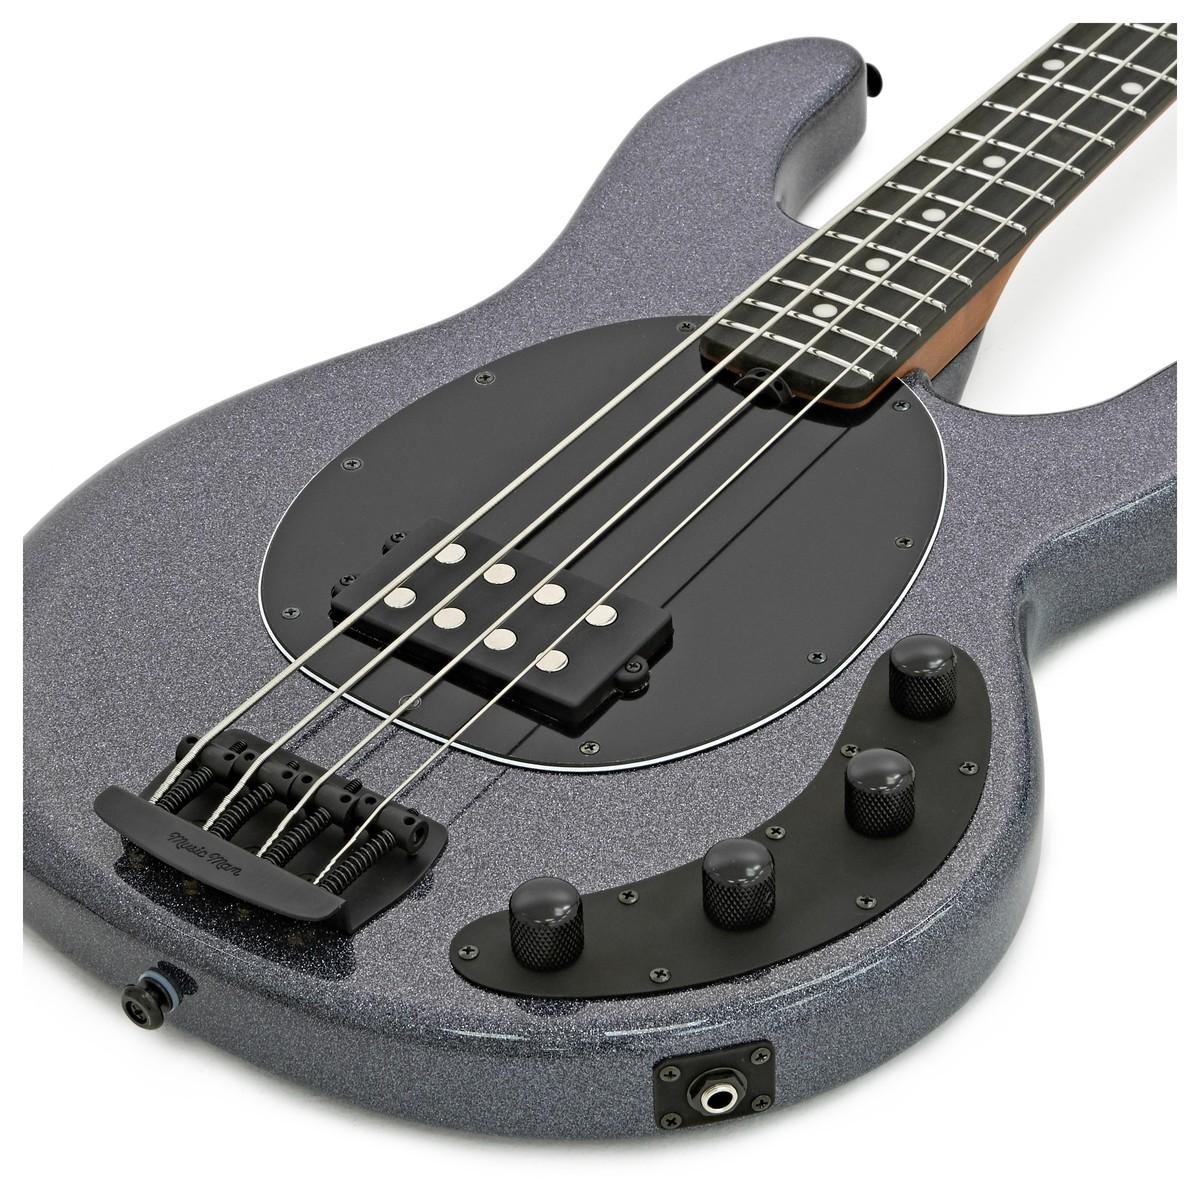 Stingray Bass Charcoal : music man stingray special bass eb charcoal sparkle at gear4music ~ Russianpoet.info Haus und Dekorationen